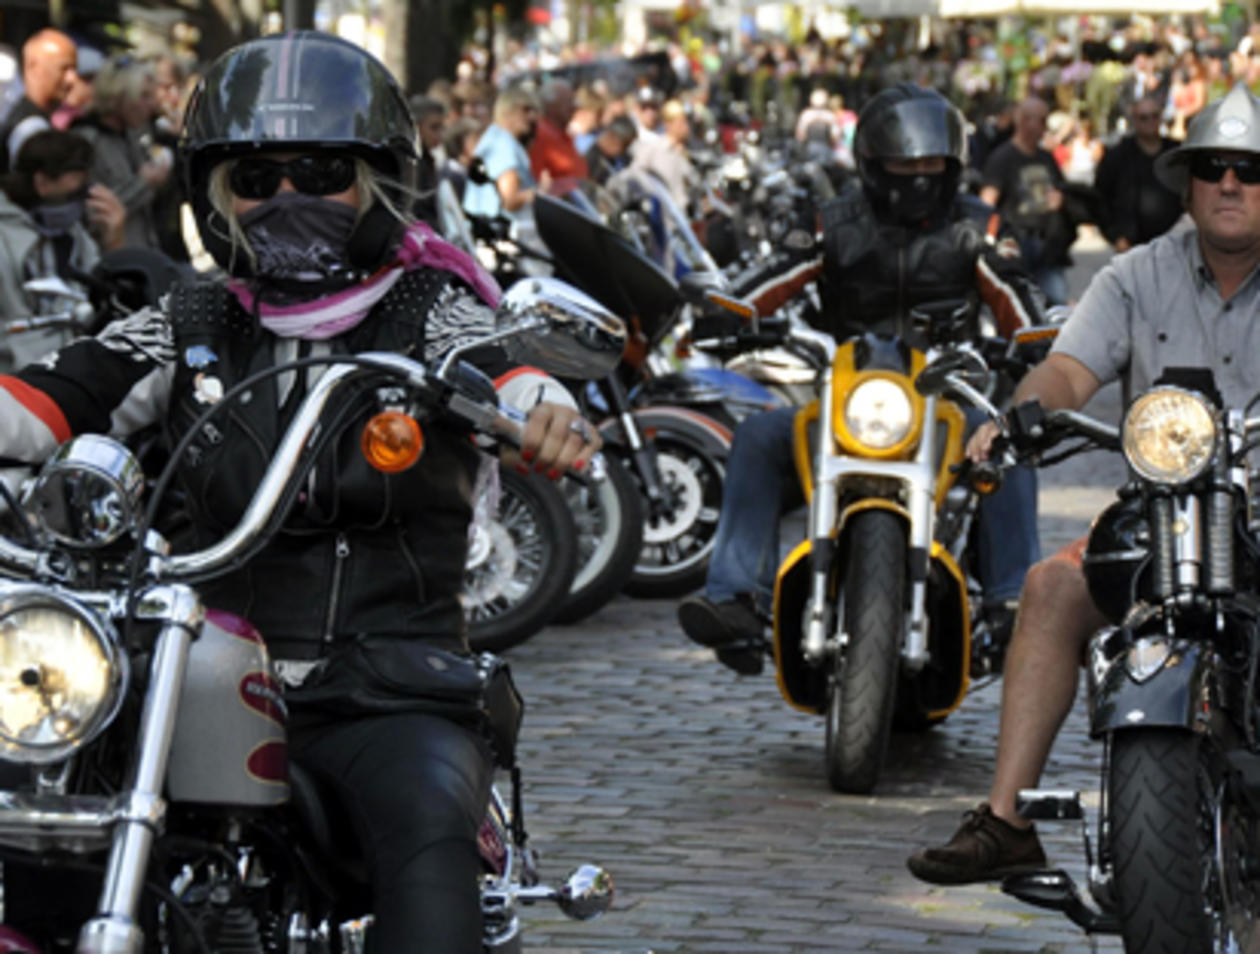 Fehmarn days of american bikes 2018